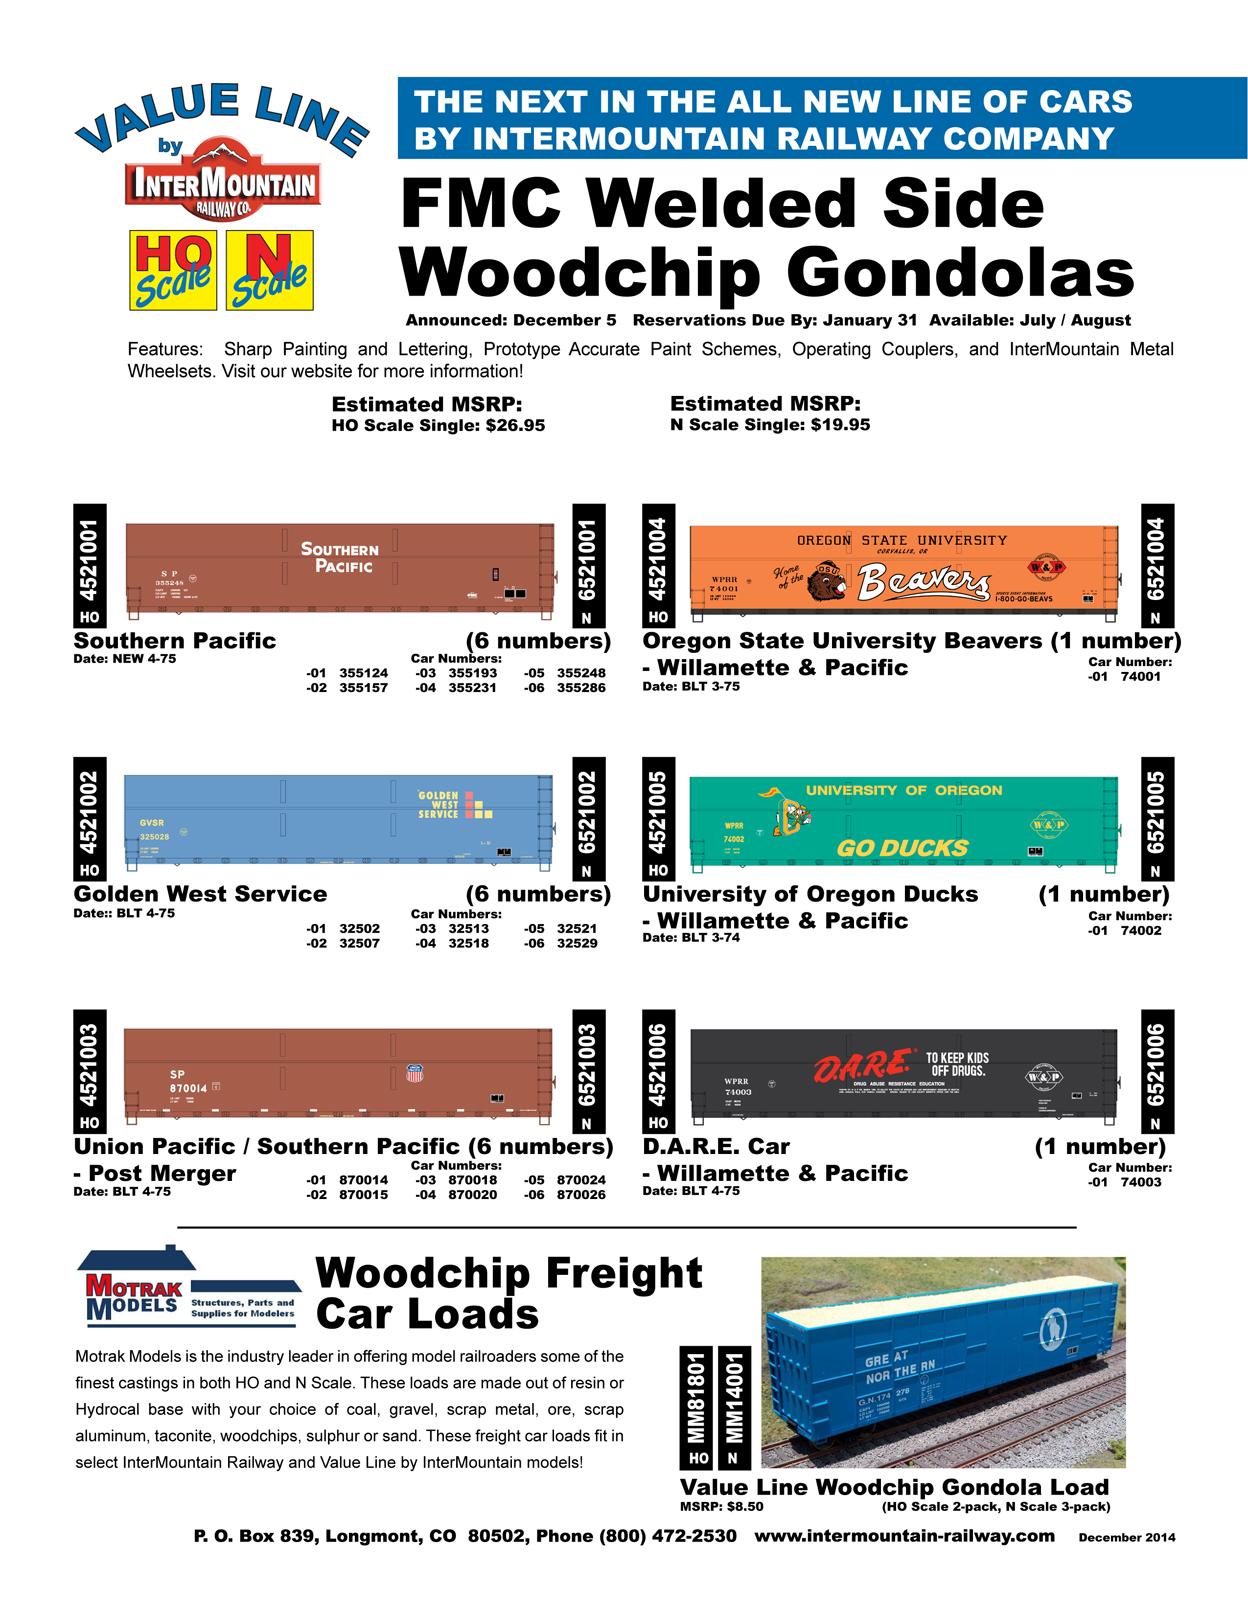 Value-Line-FMC-Wood-Chip-Gondolas.jpg